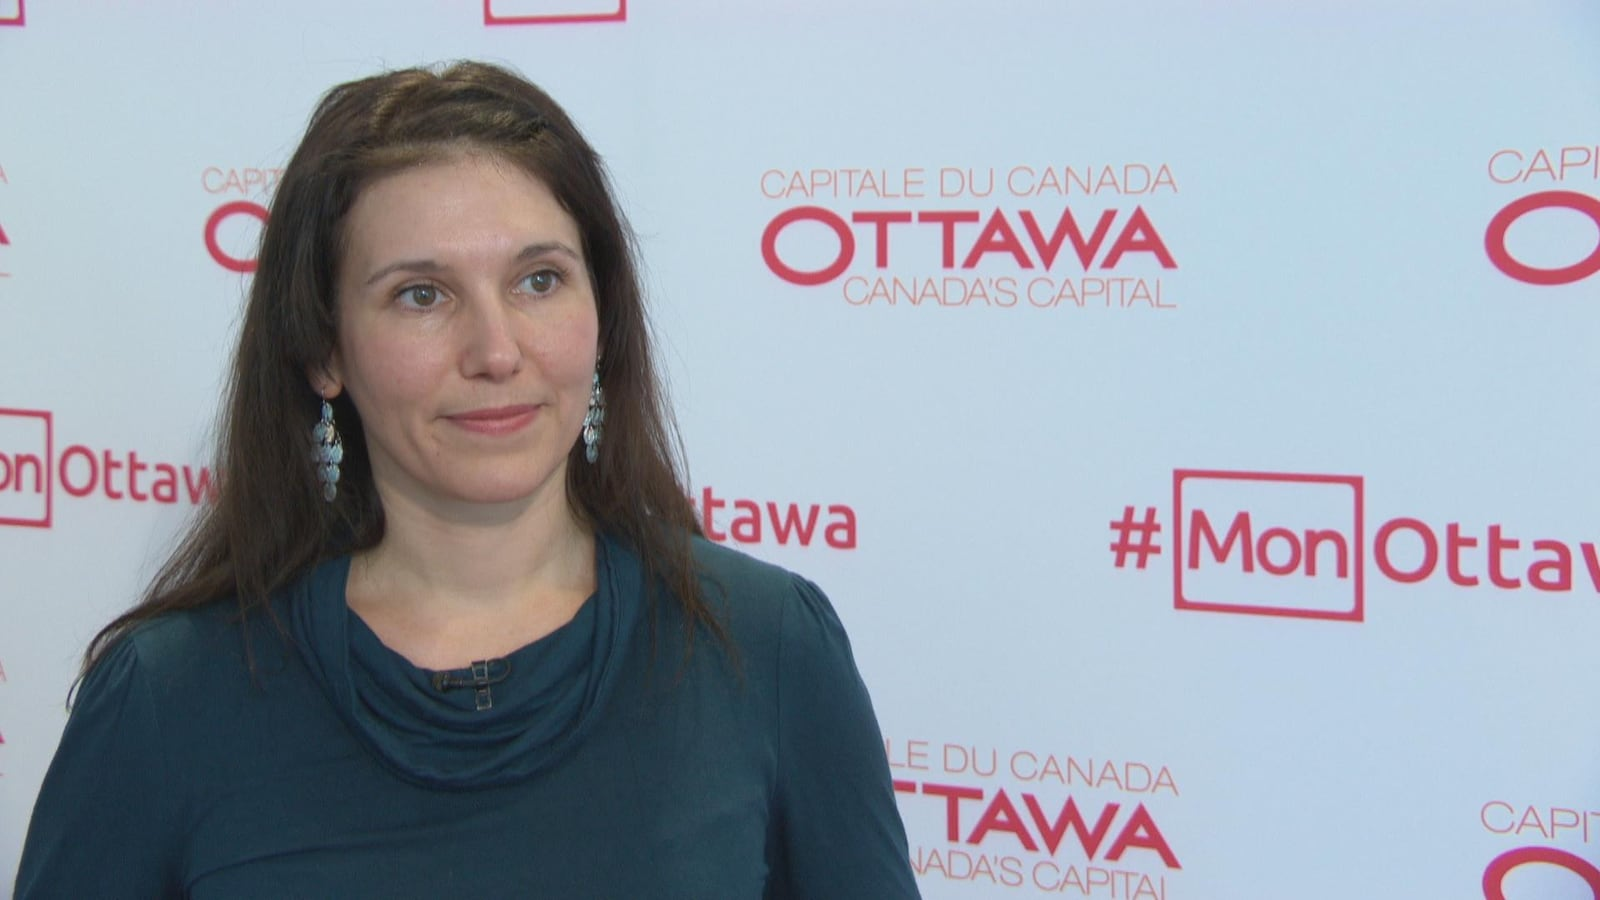 Catherine Callary en entrevue devant un fond blanc portant l'inscription « capitale du Canada, Ottawa ».